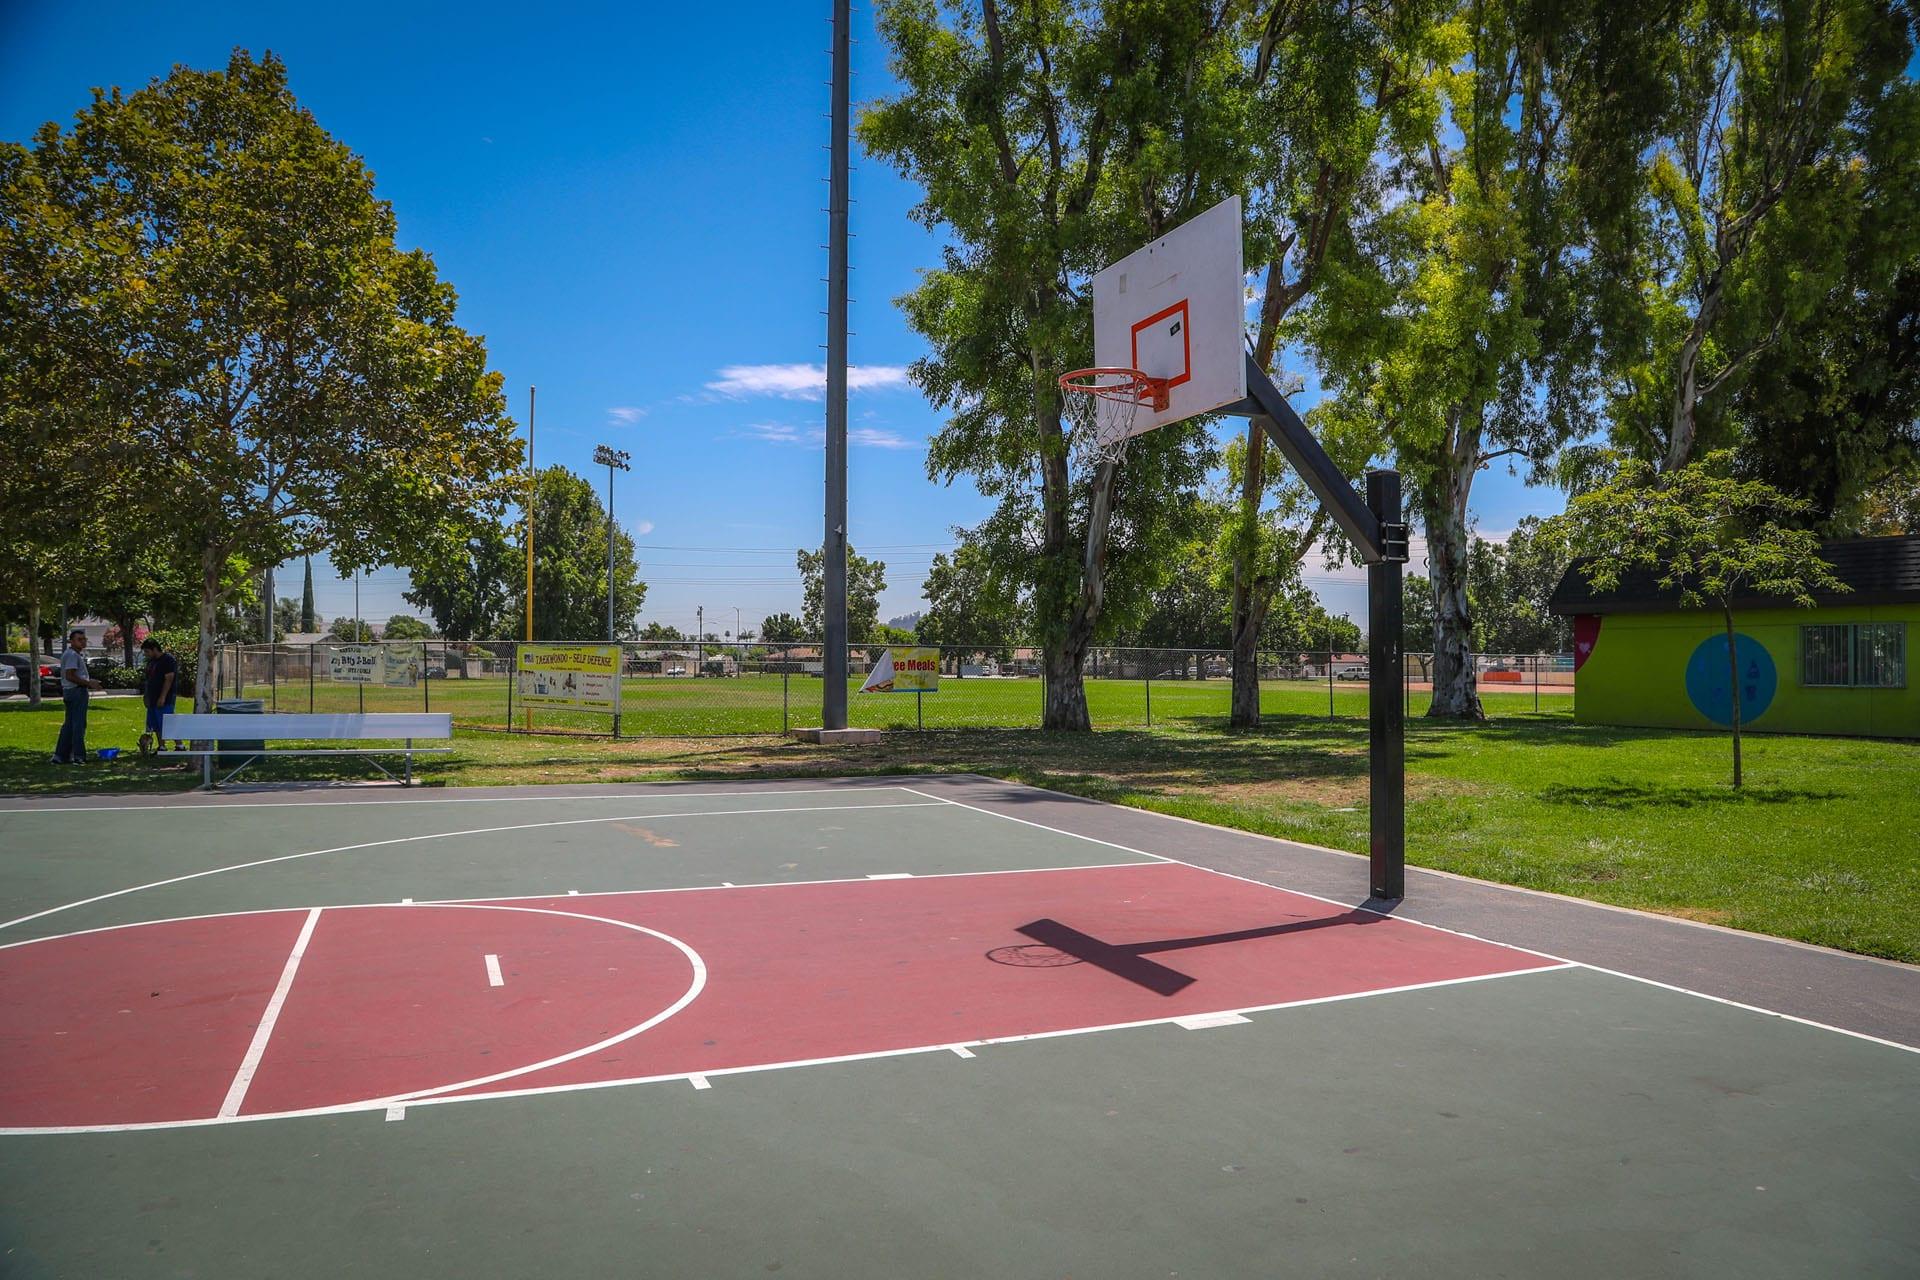 Single outdoor basketball court